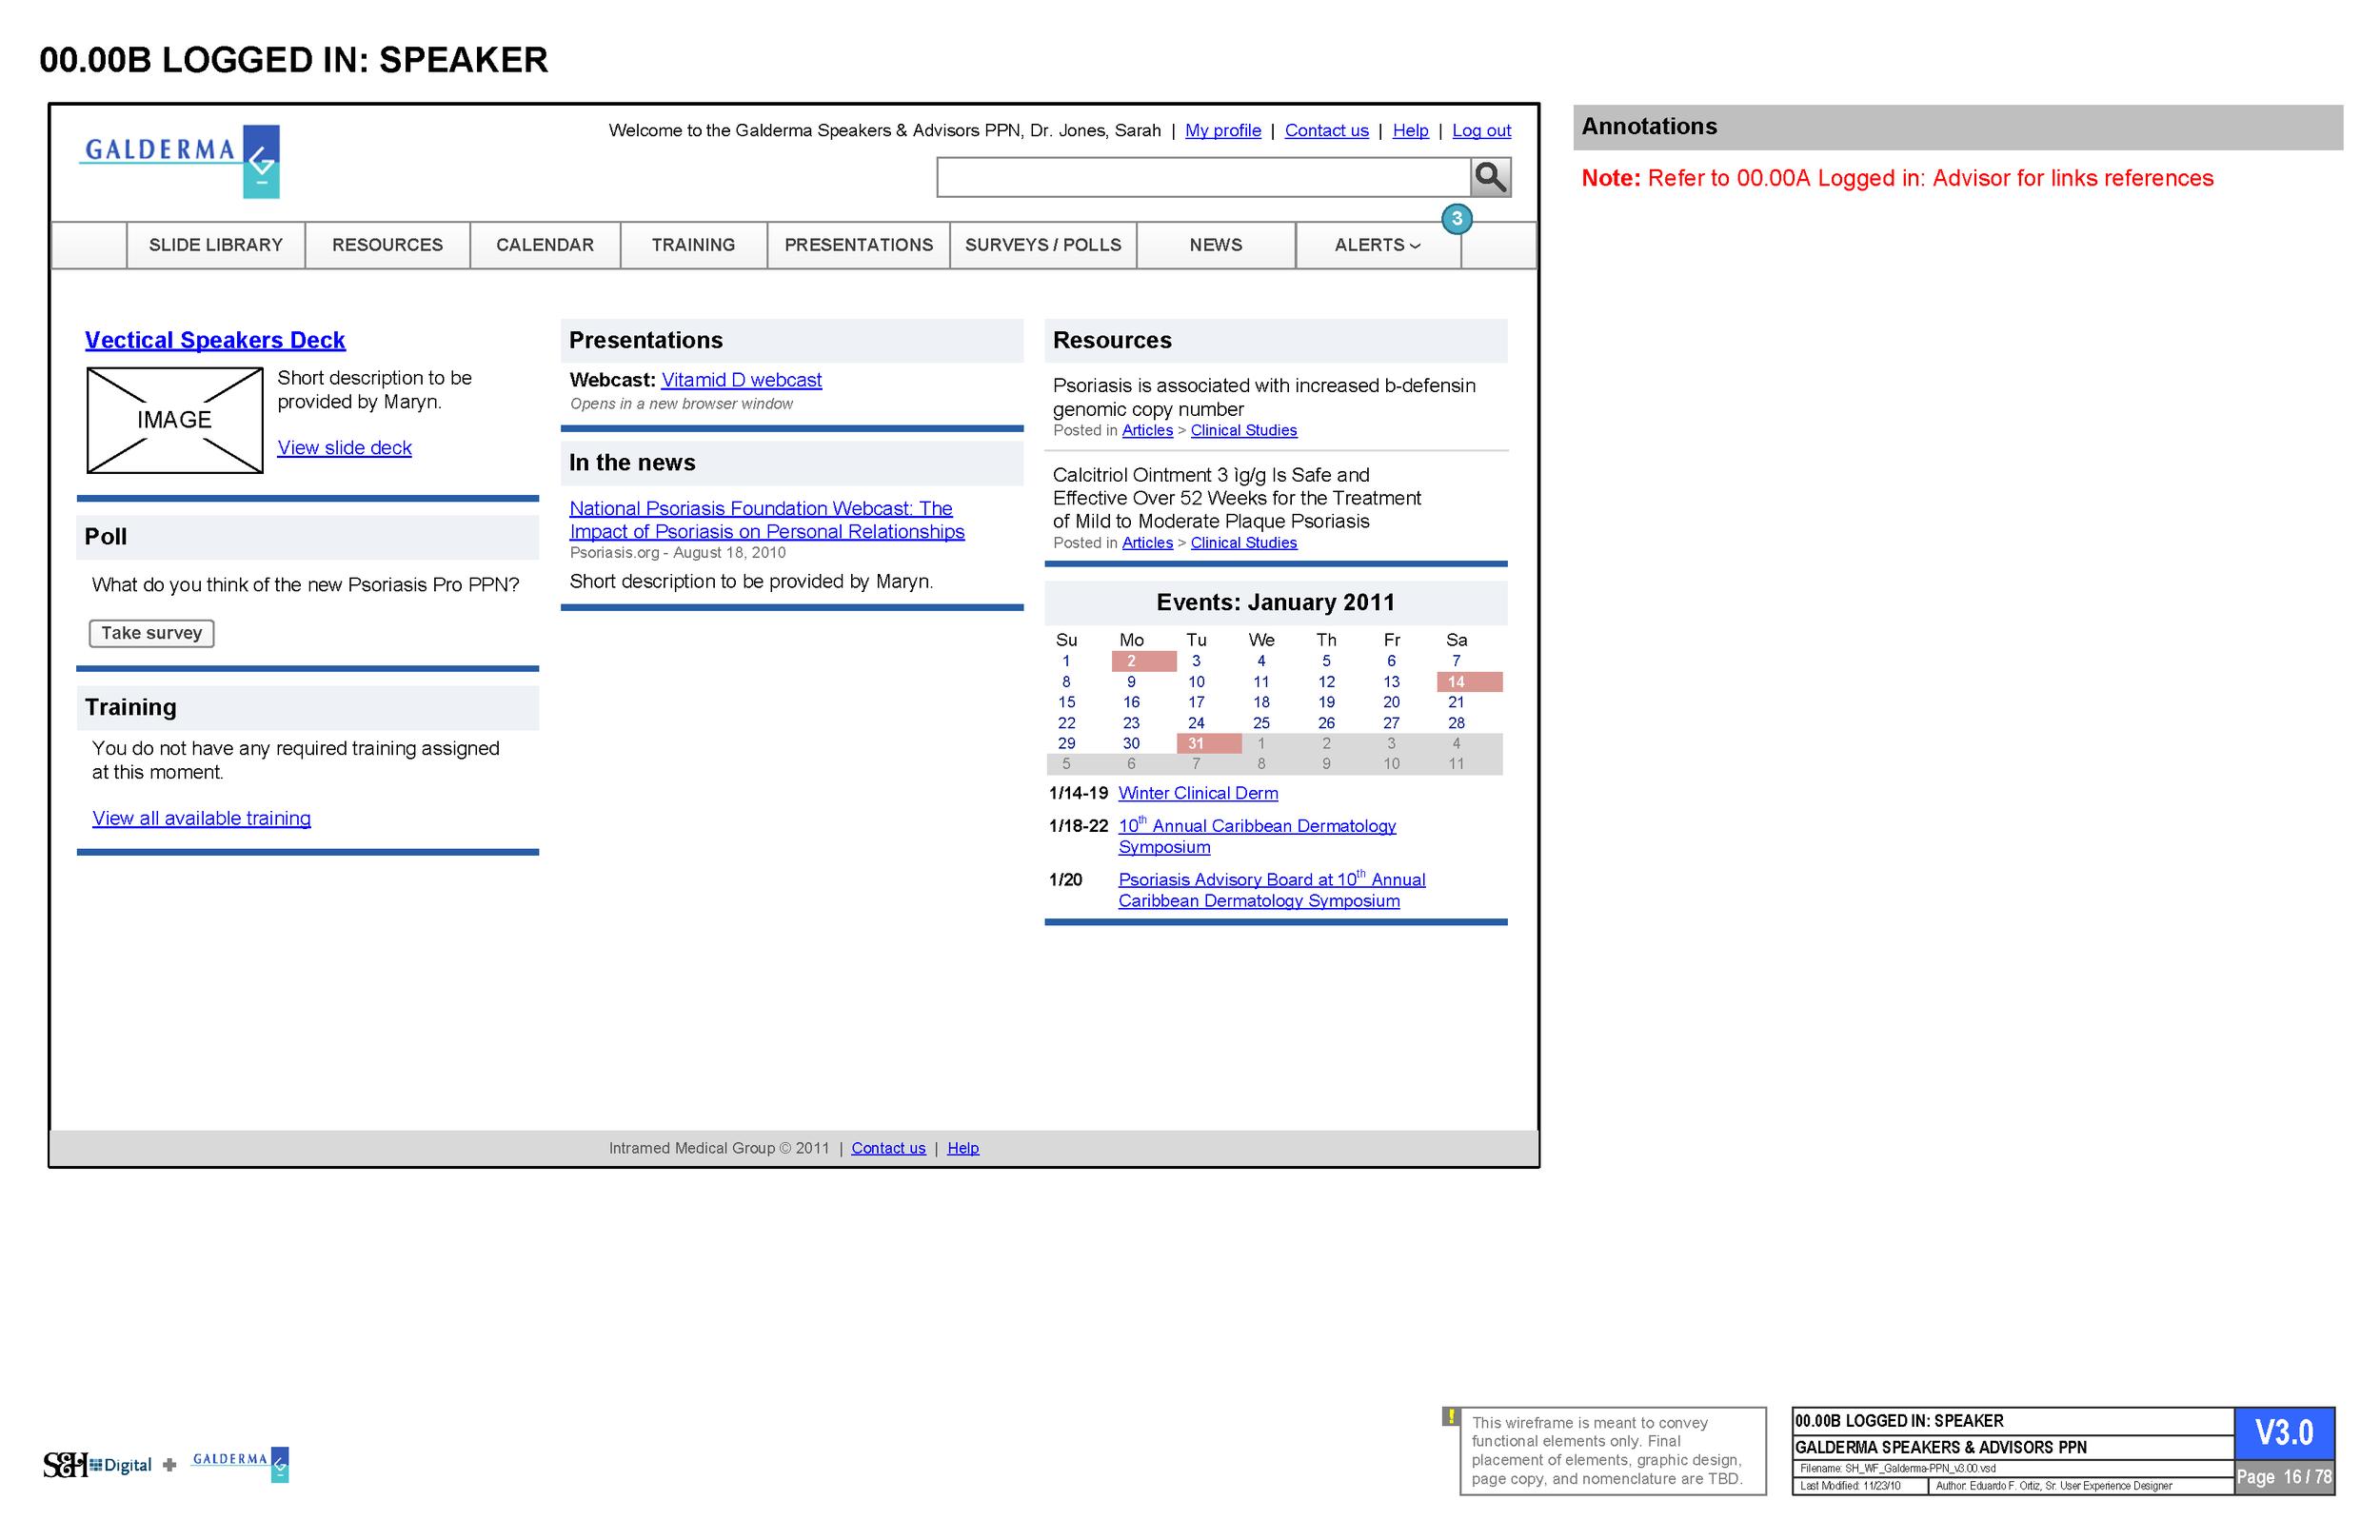 Galderma-PPN_Page_16.png